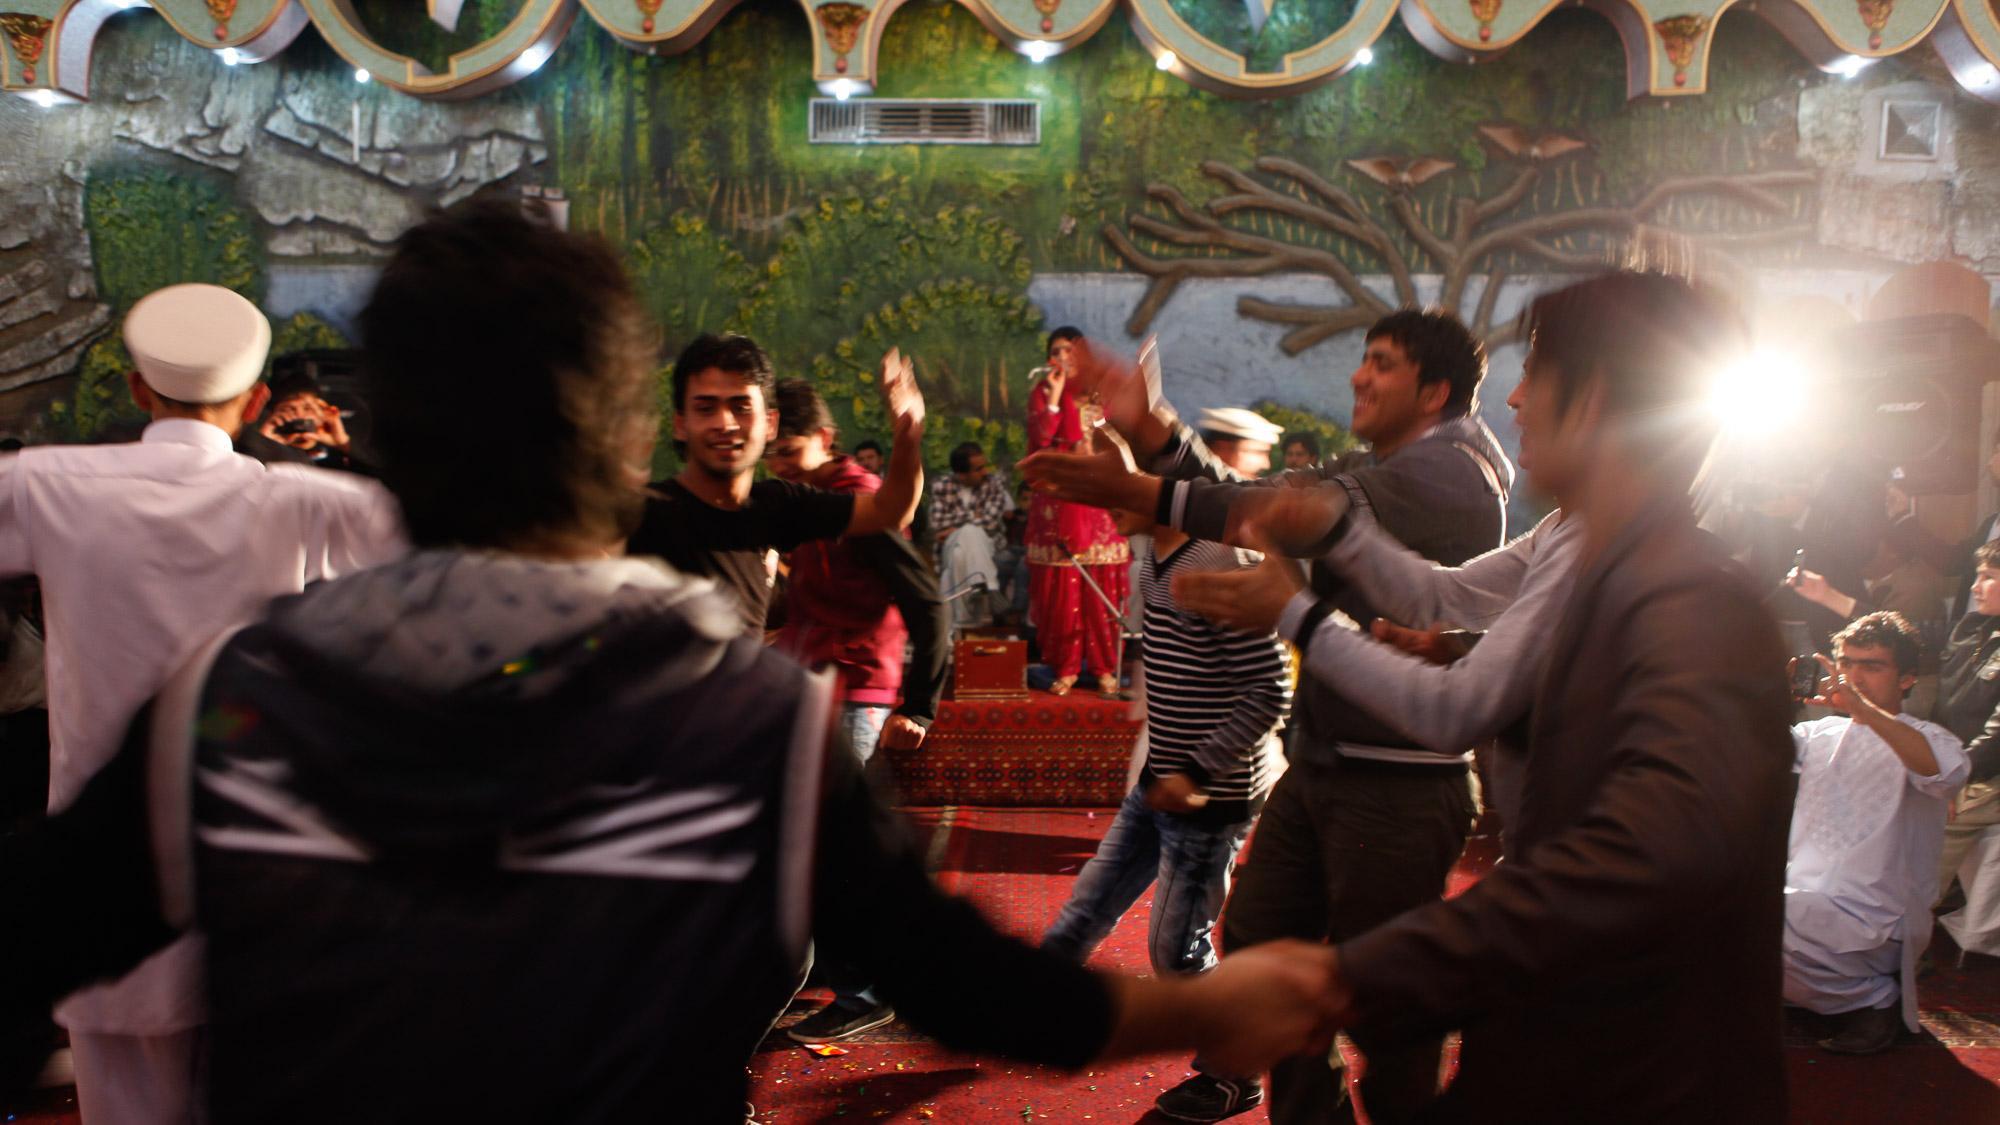 Pari performing at a wedding